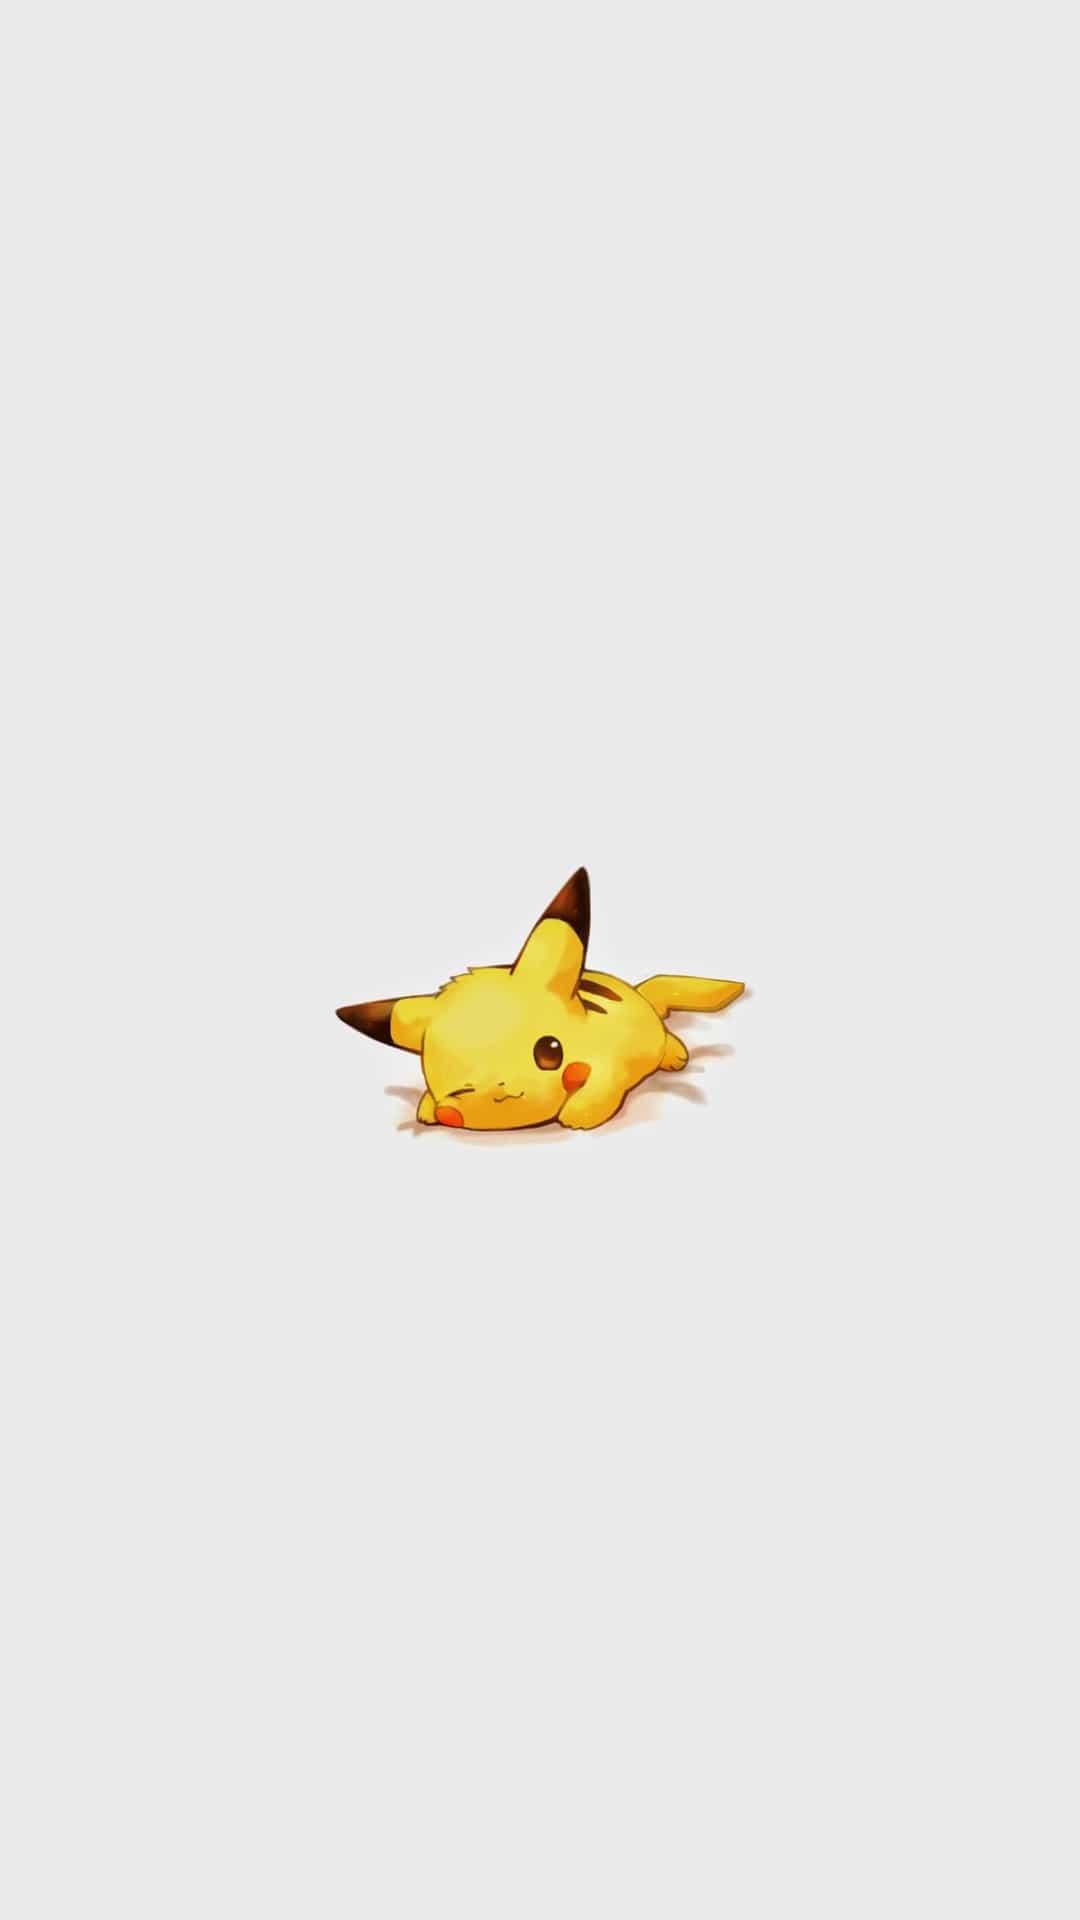 cute-pikachu-pokemon-go-illustration-android-wallpaper